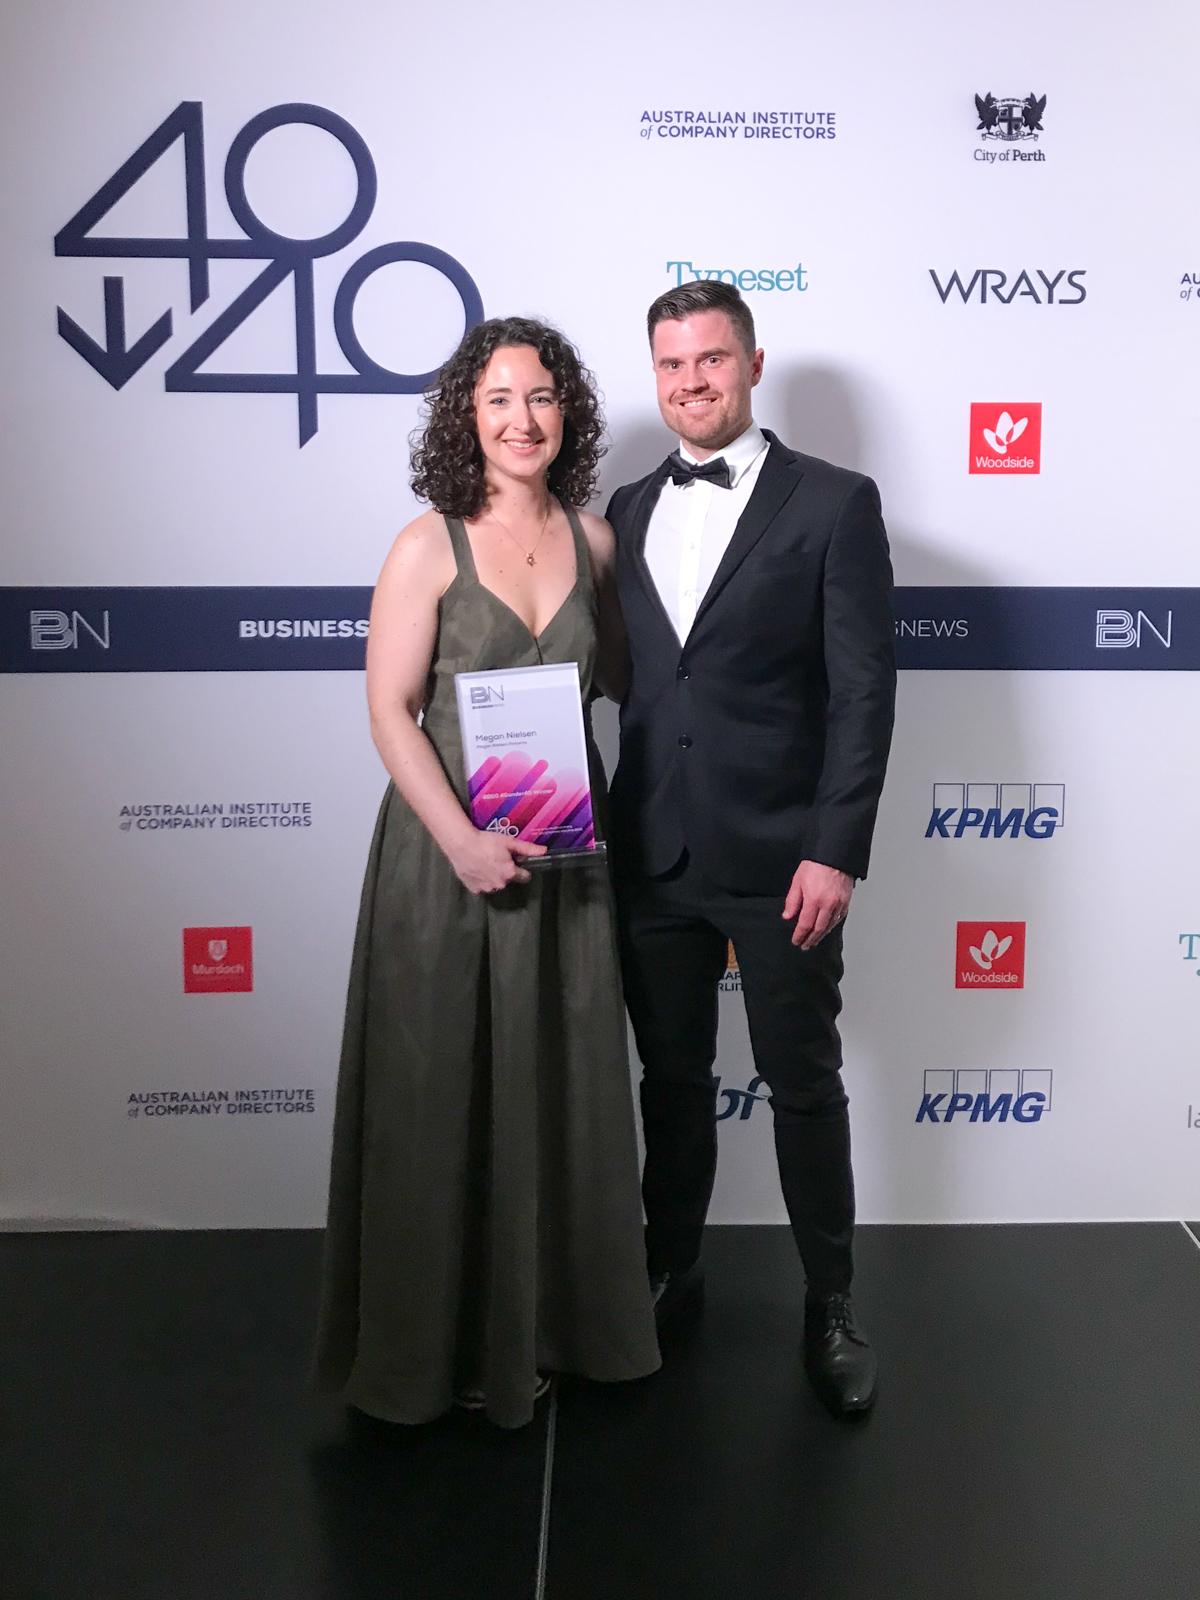 Megan Nielsen winner of the 40 Under 40 Business Awards in Western Australia